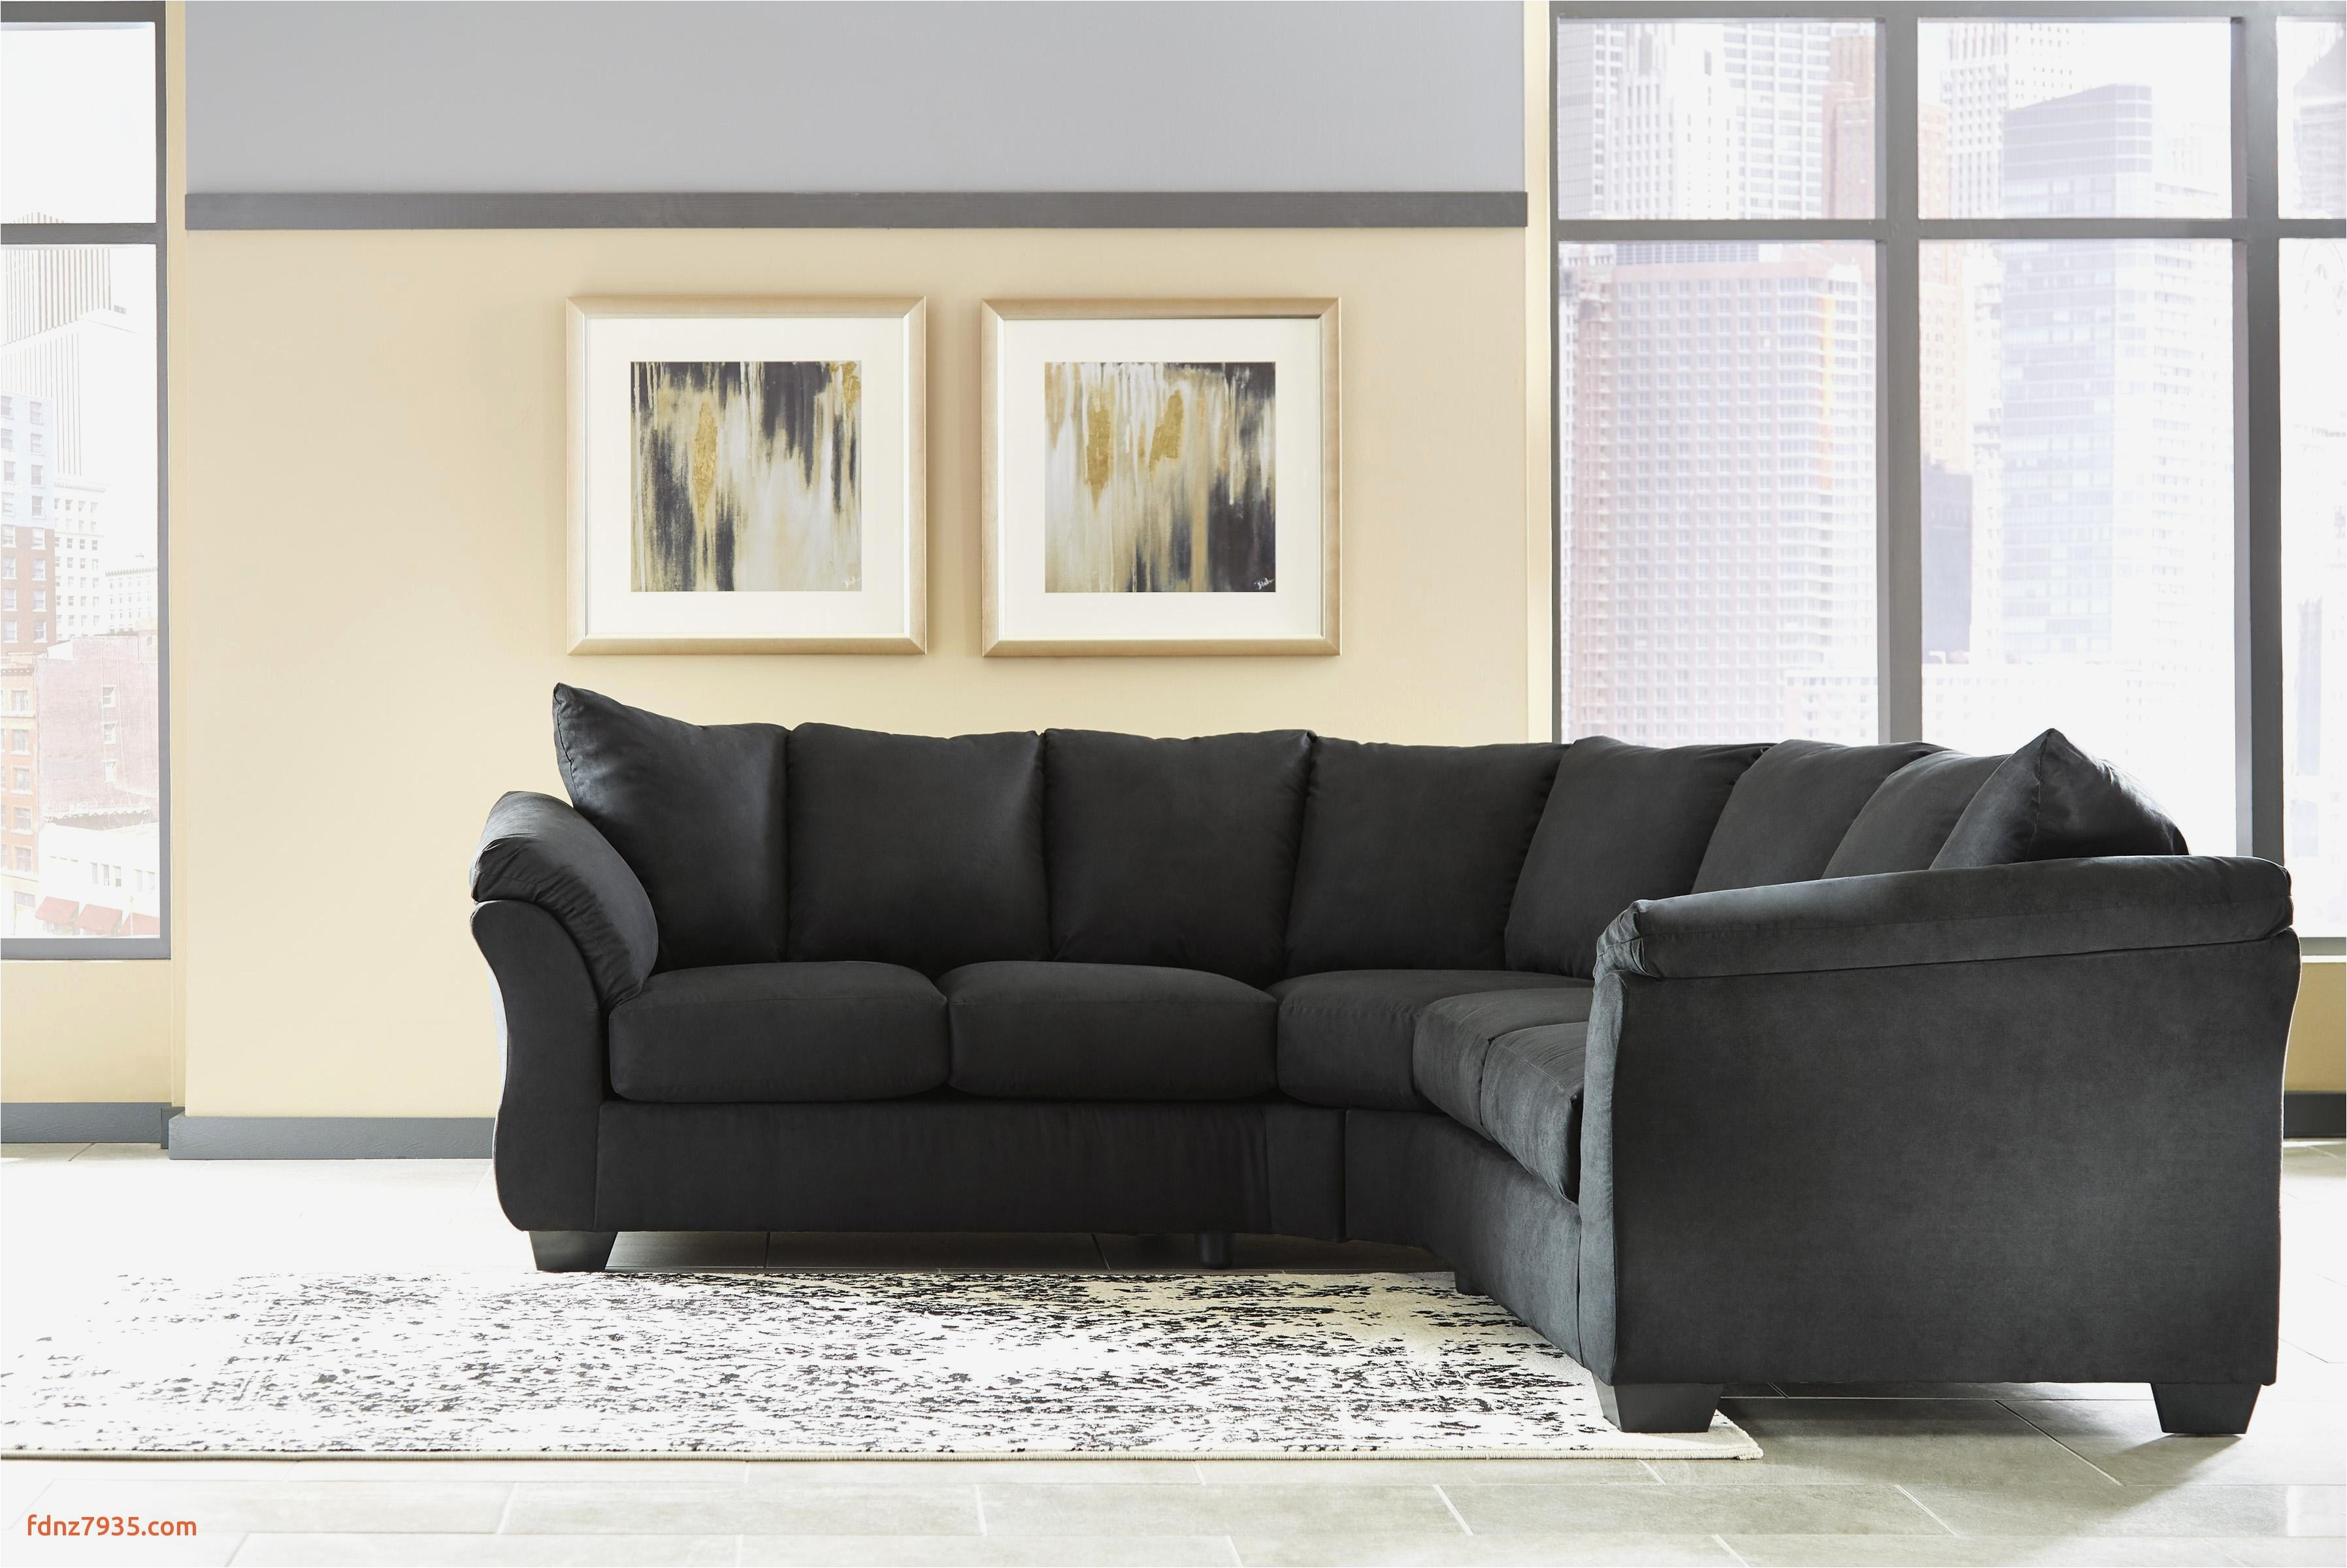 ashley furniture clearance center fresh 21 new ashley furniture chaise sofa graphics everythingalyce image of ashley